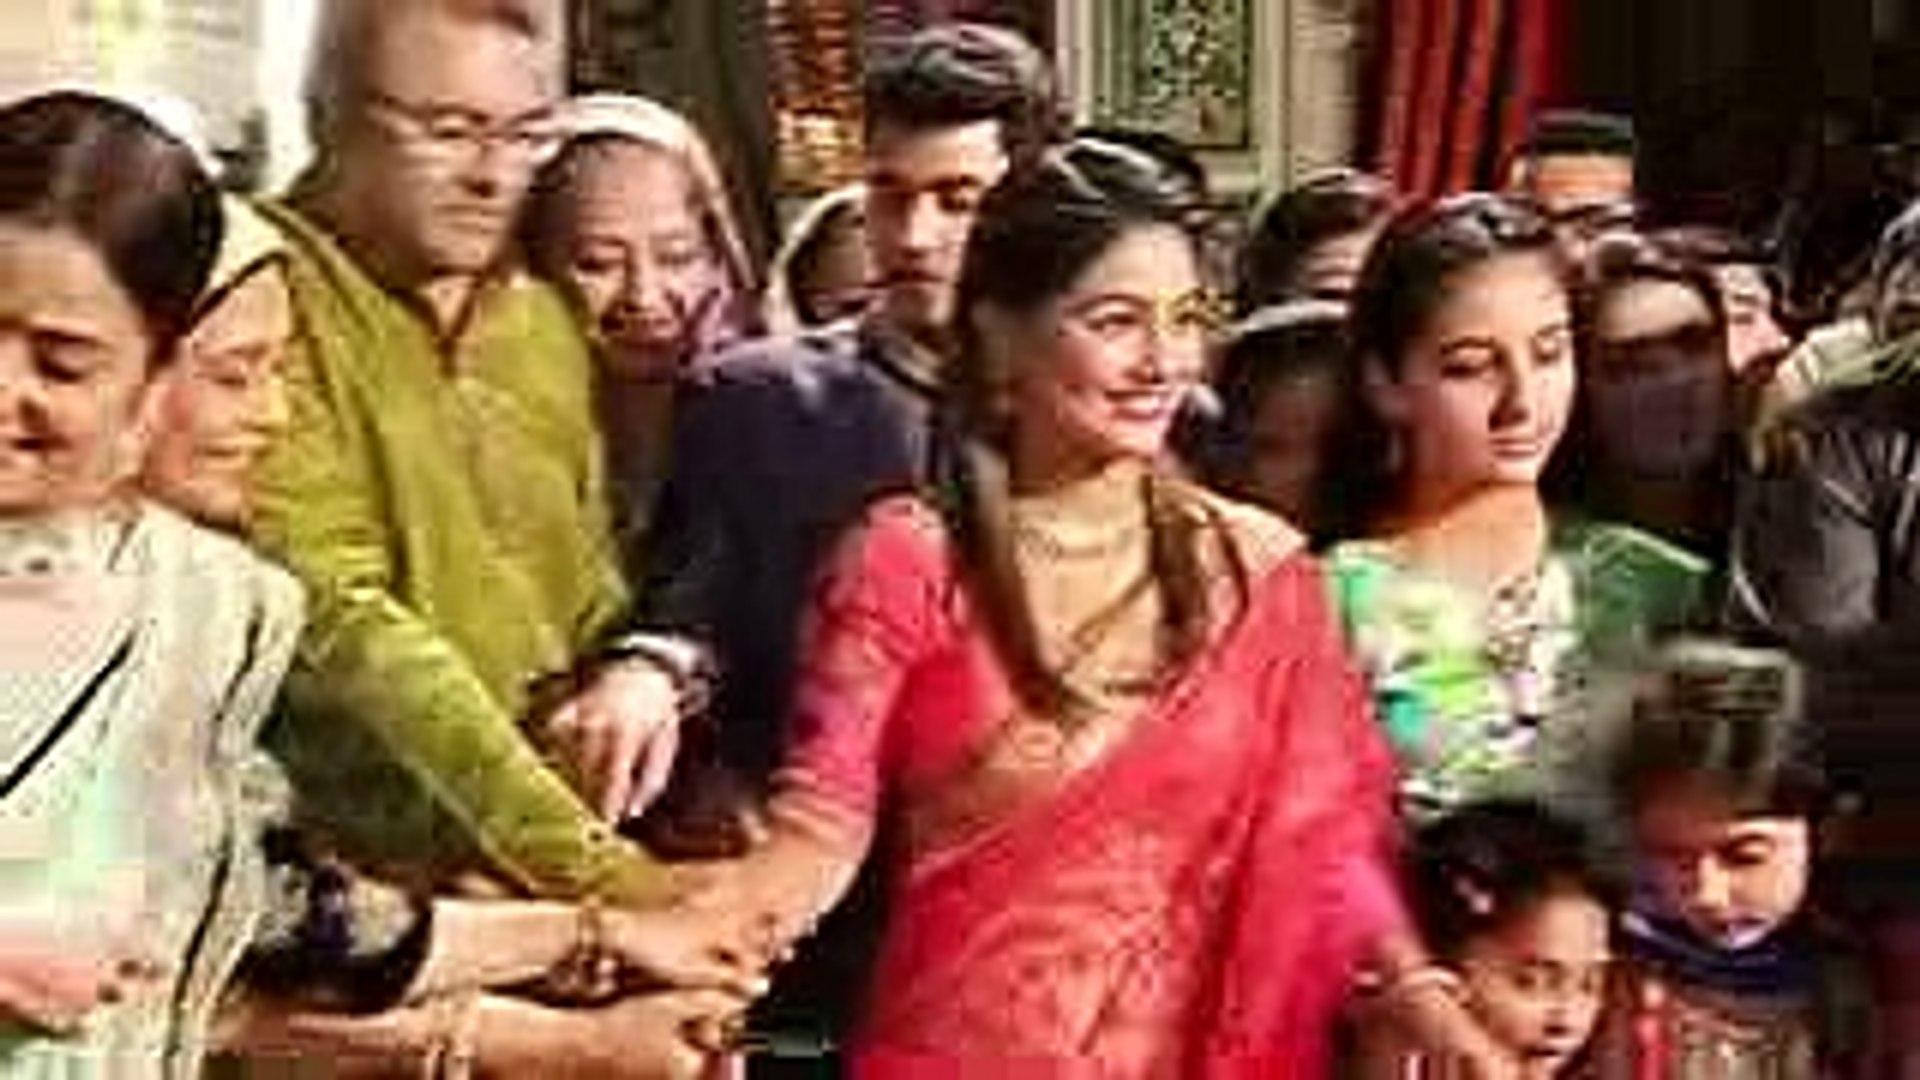 BIGG BOSS 10 - Hina Khan To Enter Bigg Boss House - CONFIRMED